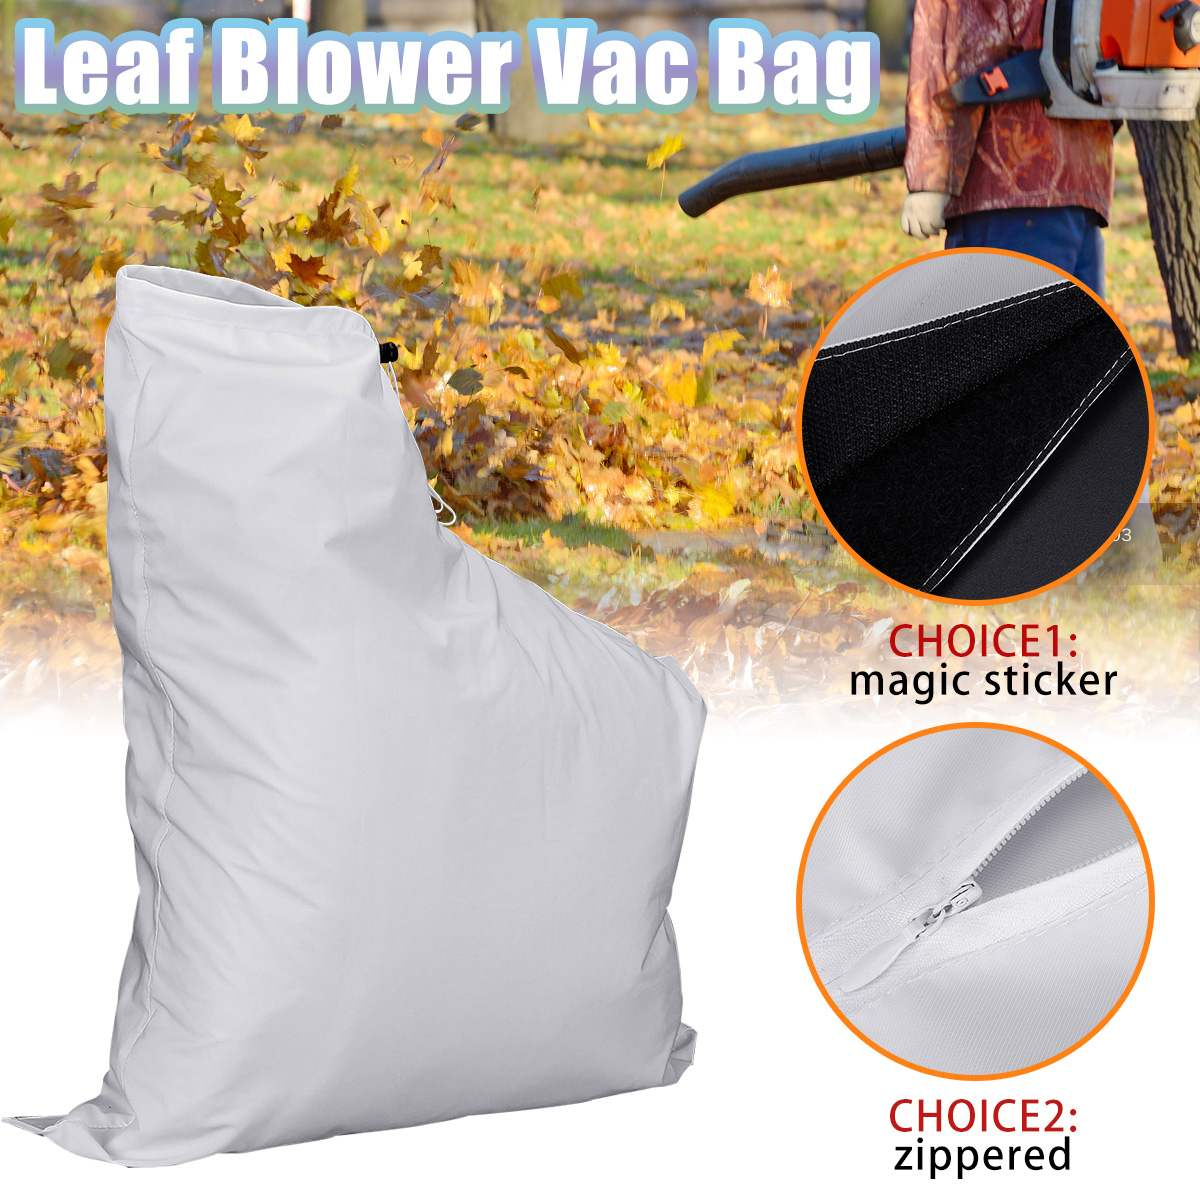 Leaf Blower Vacuum Bag Fit For Weed Eater Barracuda 2595 Type 1 Lawn Yard Shredder Garden Tool Storage Bag Accessories